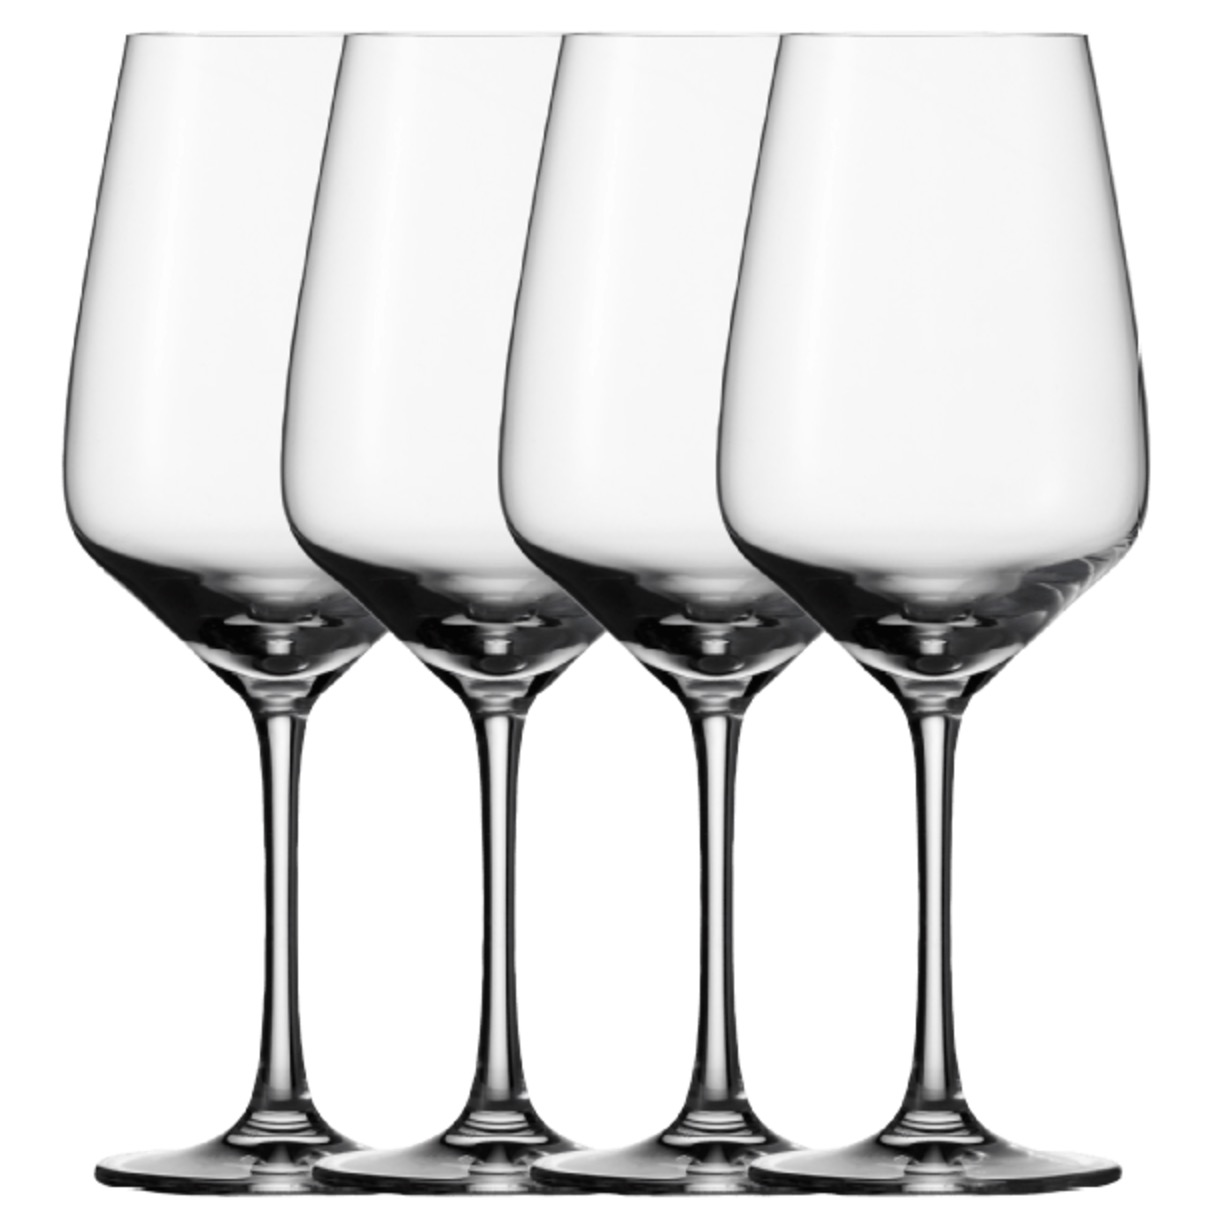 4 Vivo (Villeroy & Boch) Basic Rotweingläser für nur 8,- Euro inkl. Versand